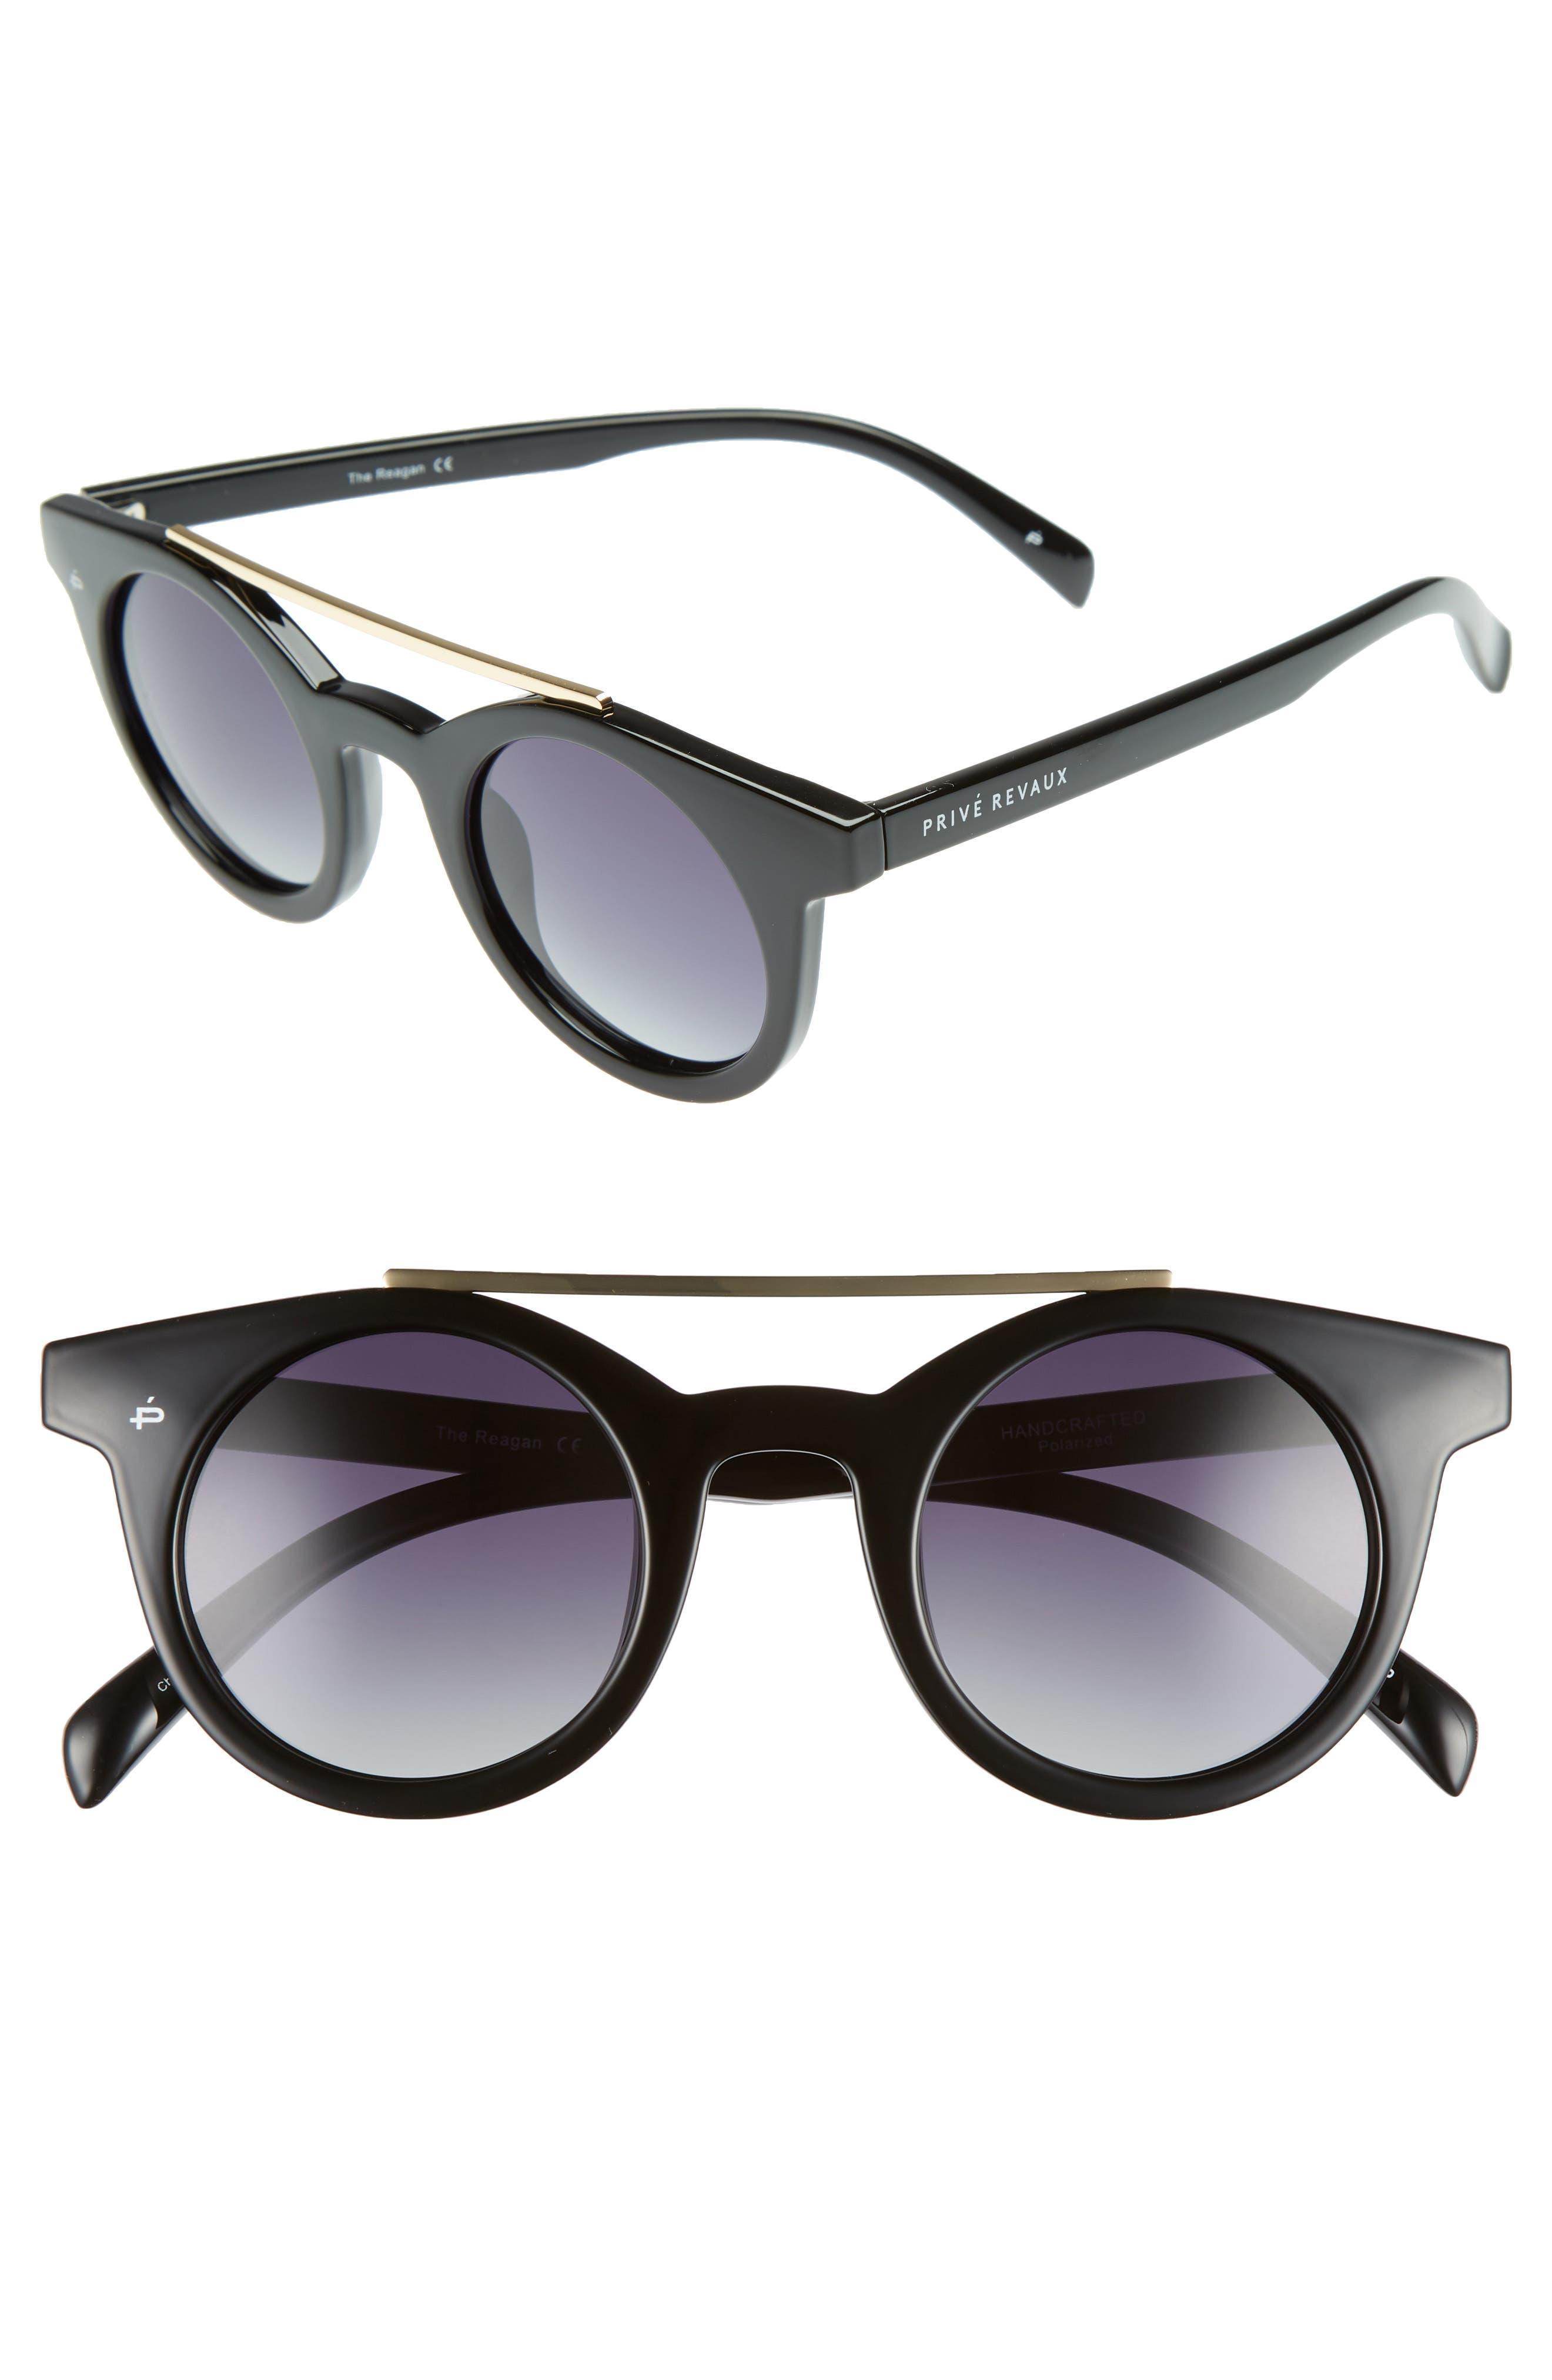 Privé Revaux The Reagan 43mm Polarized Round Sunglasses,                         Main,                         color, Black